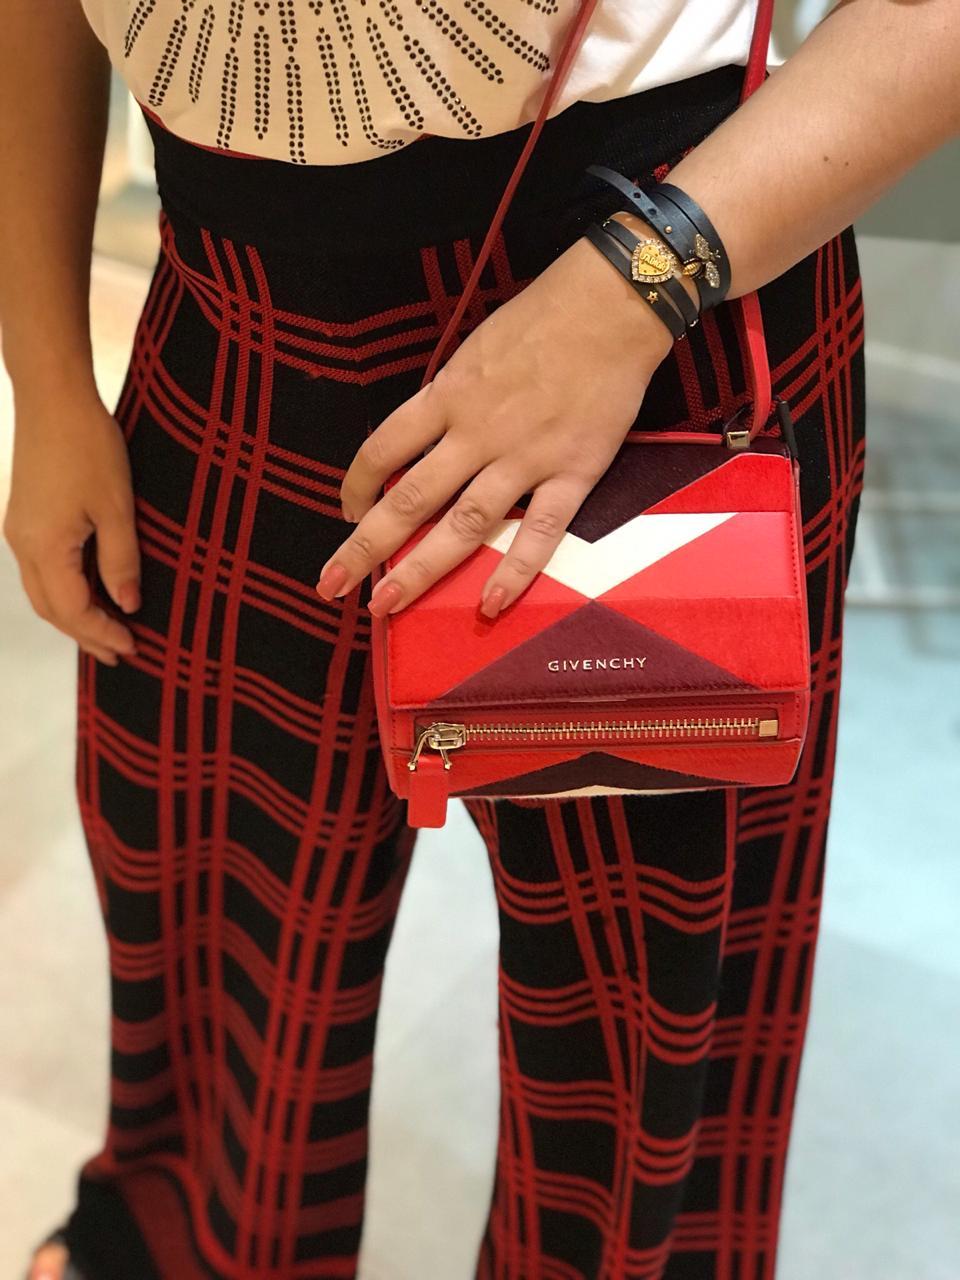 Bolsa Givenchy Graphic Cereja - Ref.2804